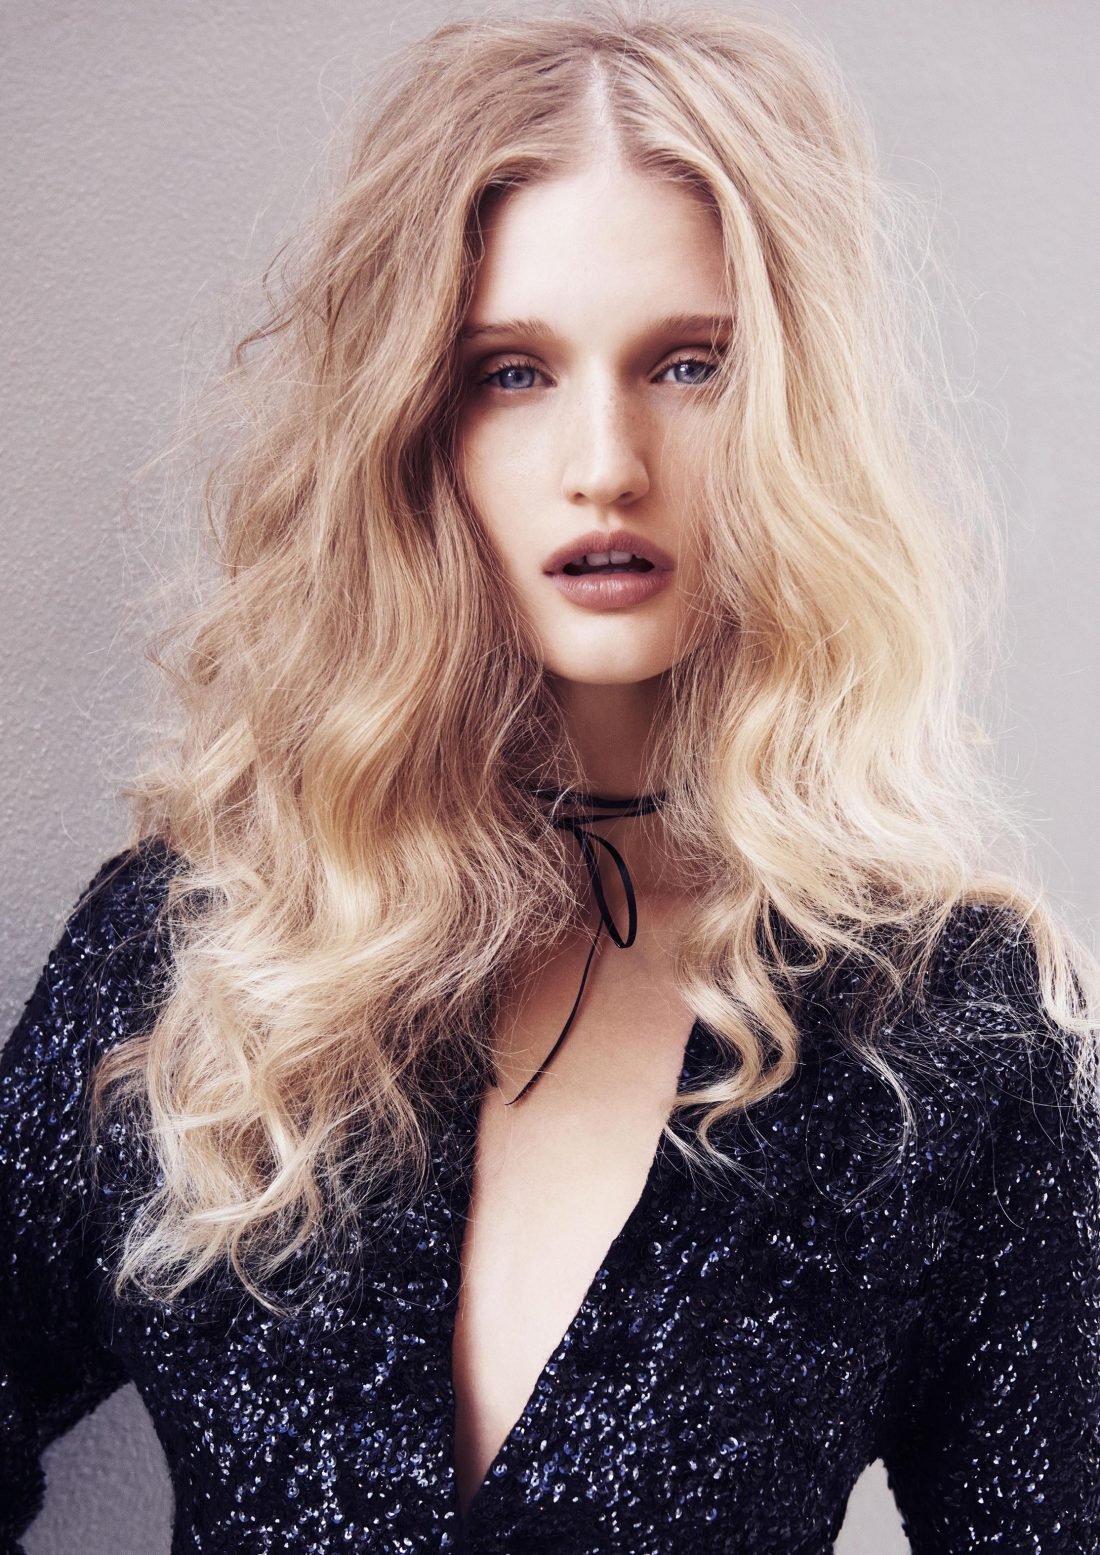 Servilles AW16 campaign, 'One Girl, Four Looks'. Hair: @servilleshair creative team Photographer: @andrewotoolestudios  Make-up: #virginiacarde  Stylist: @victoriaharvy